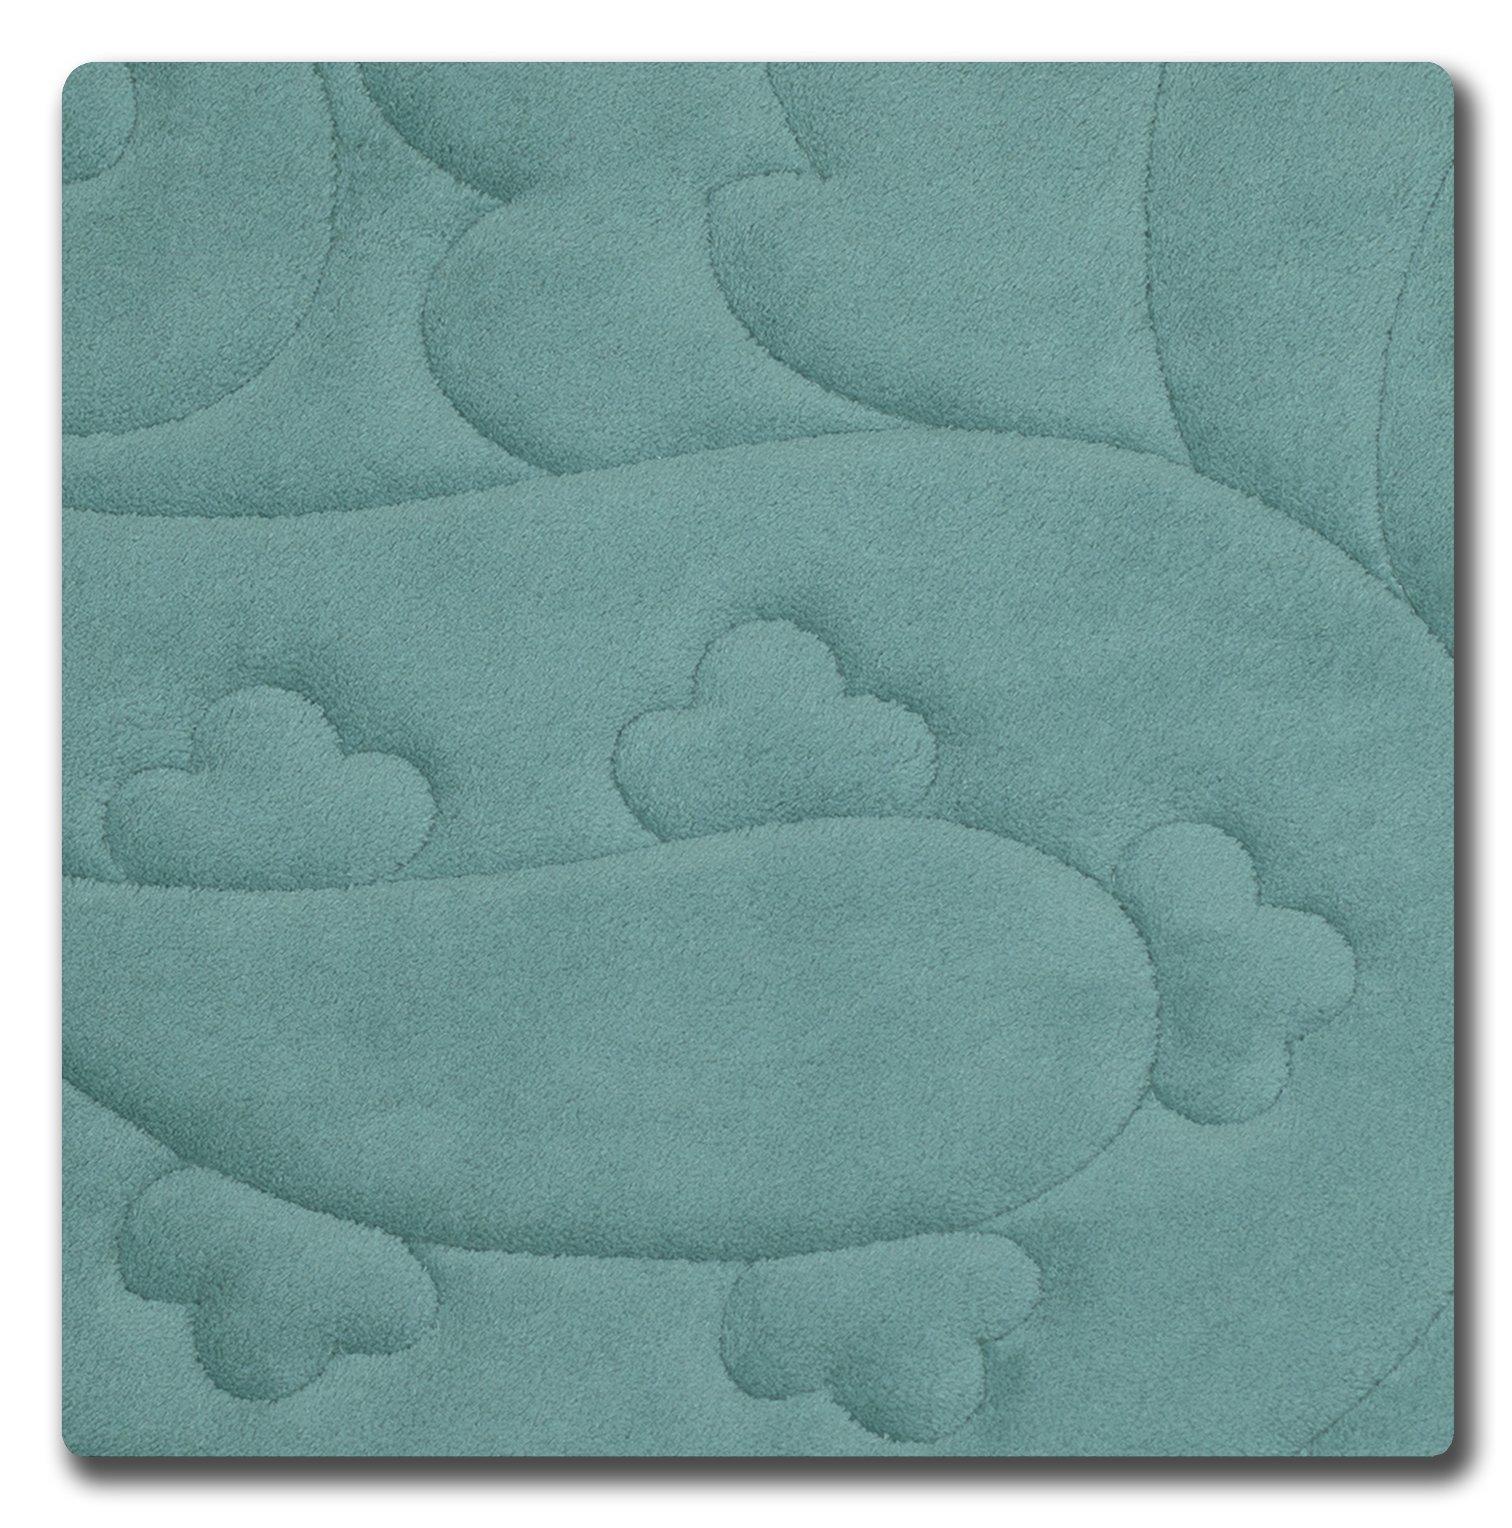 Bounce Comfort Pelton Micro Plush Memory Foam Bath Mat with BounceComfort, 20 x 32 in. Marine Blue -  - bathroom-linens, bathroom, bath-mats - 814HPM%2BbdFL -